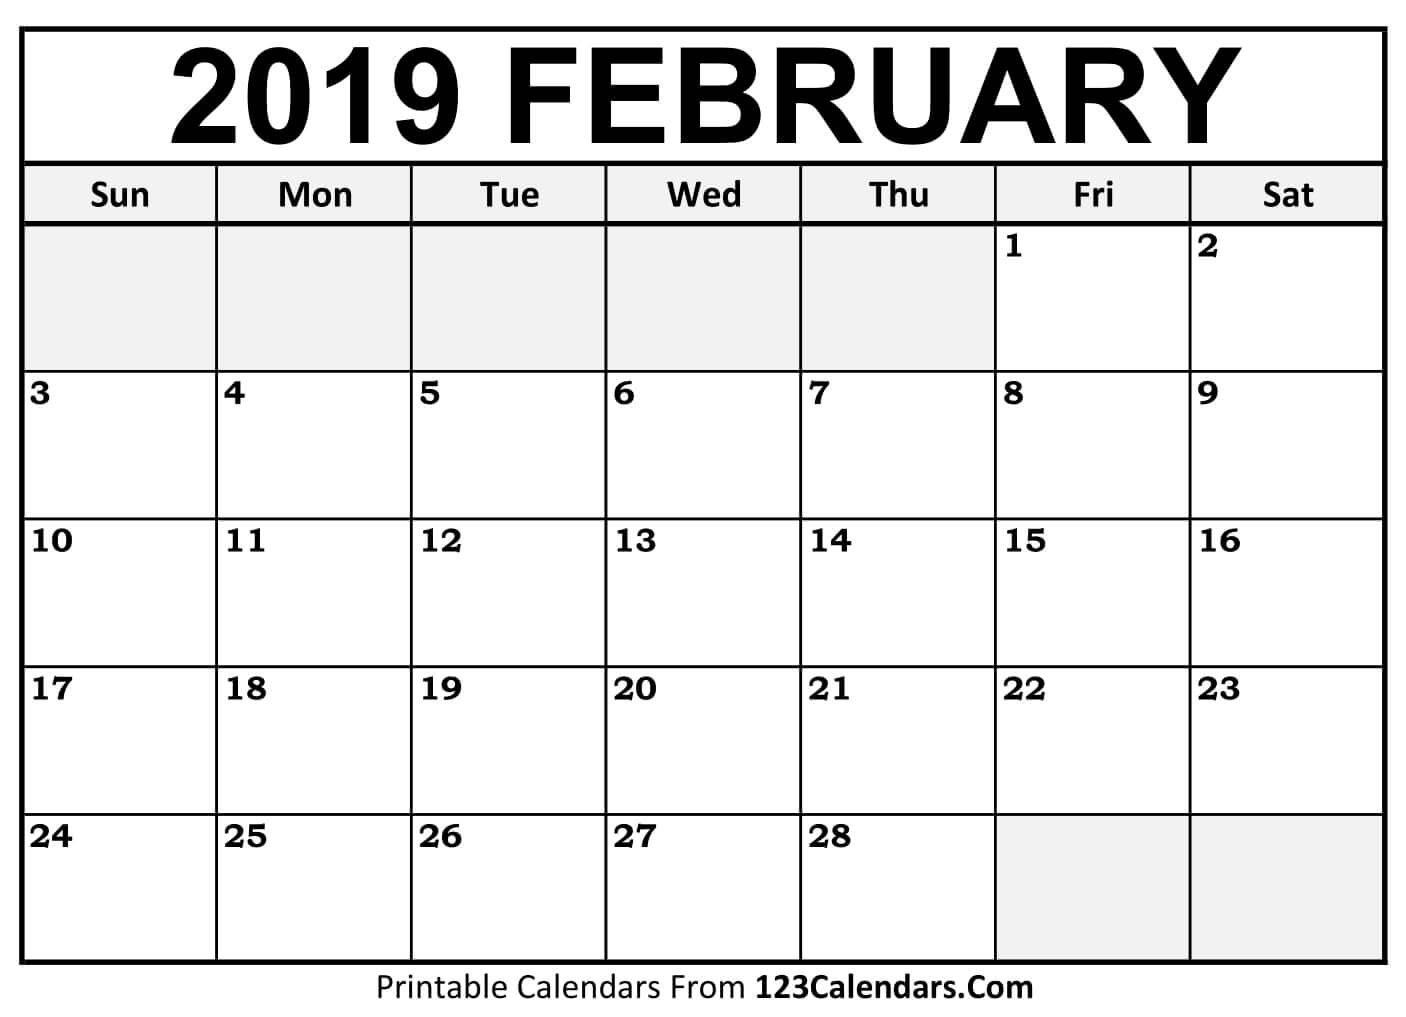 2019 February Calendar Holidays In Word – Printable Calendar 2019 Calendar 2019 February Printable